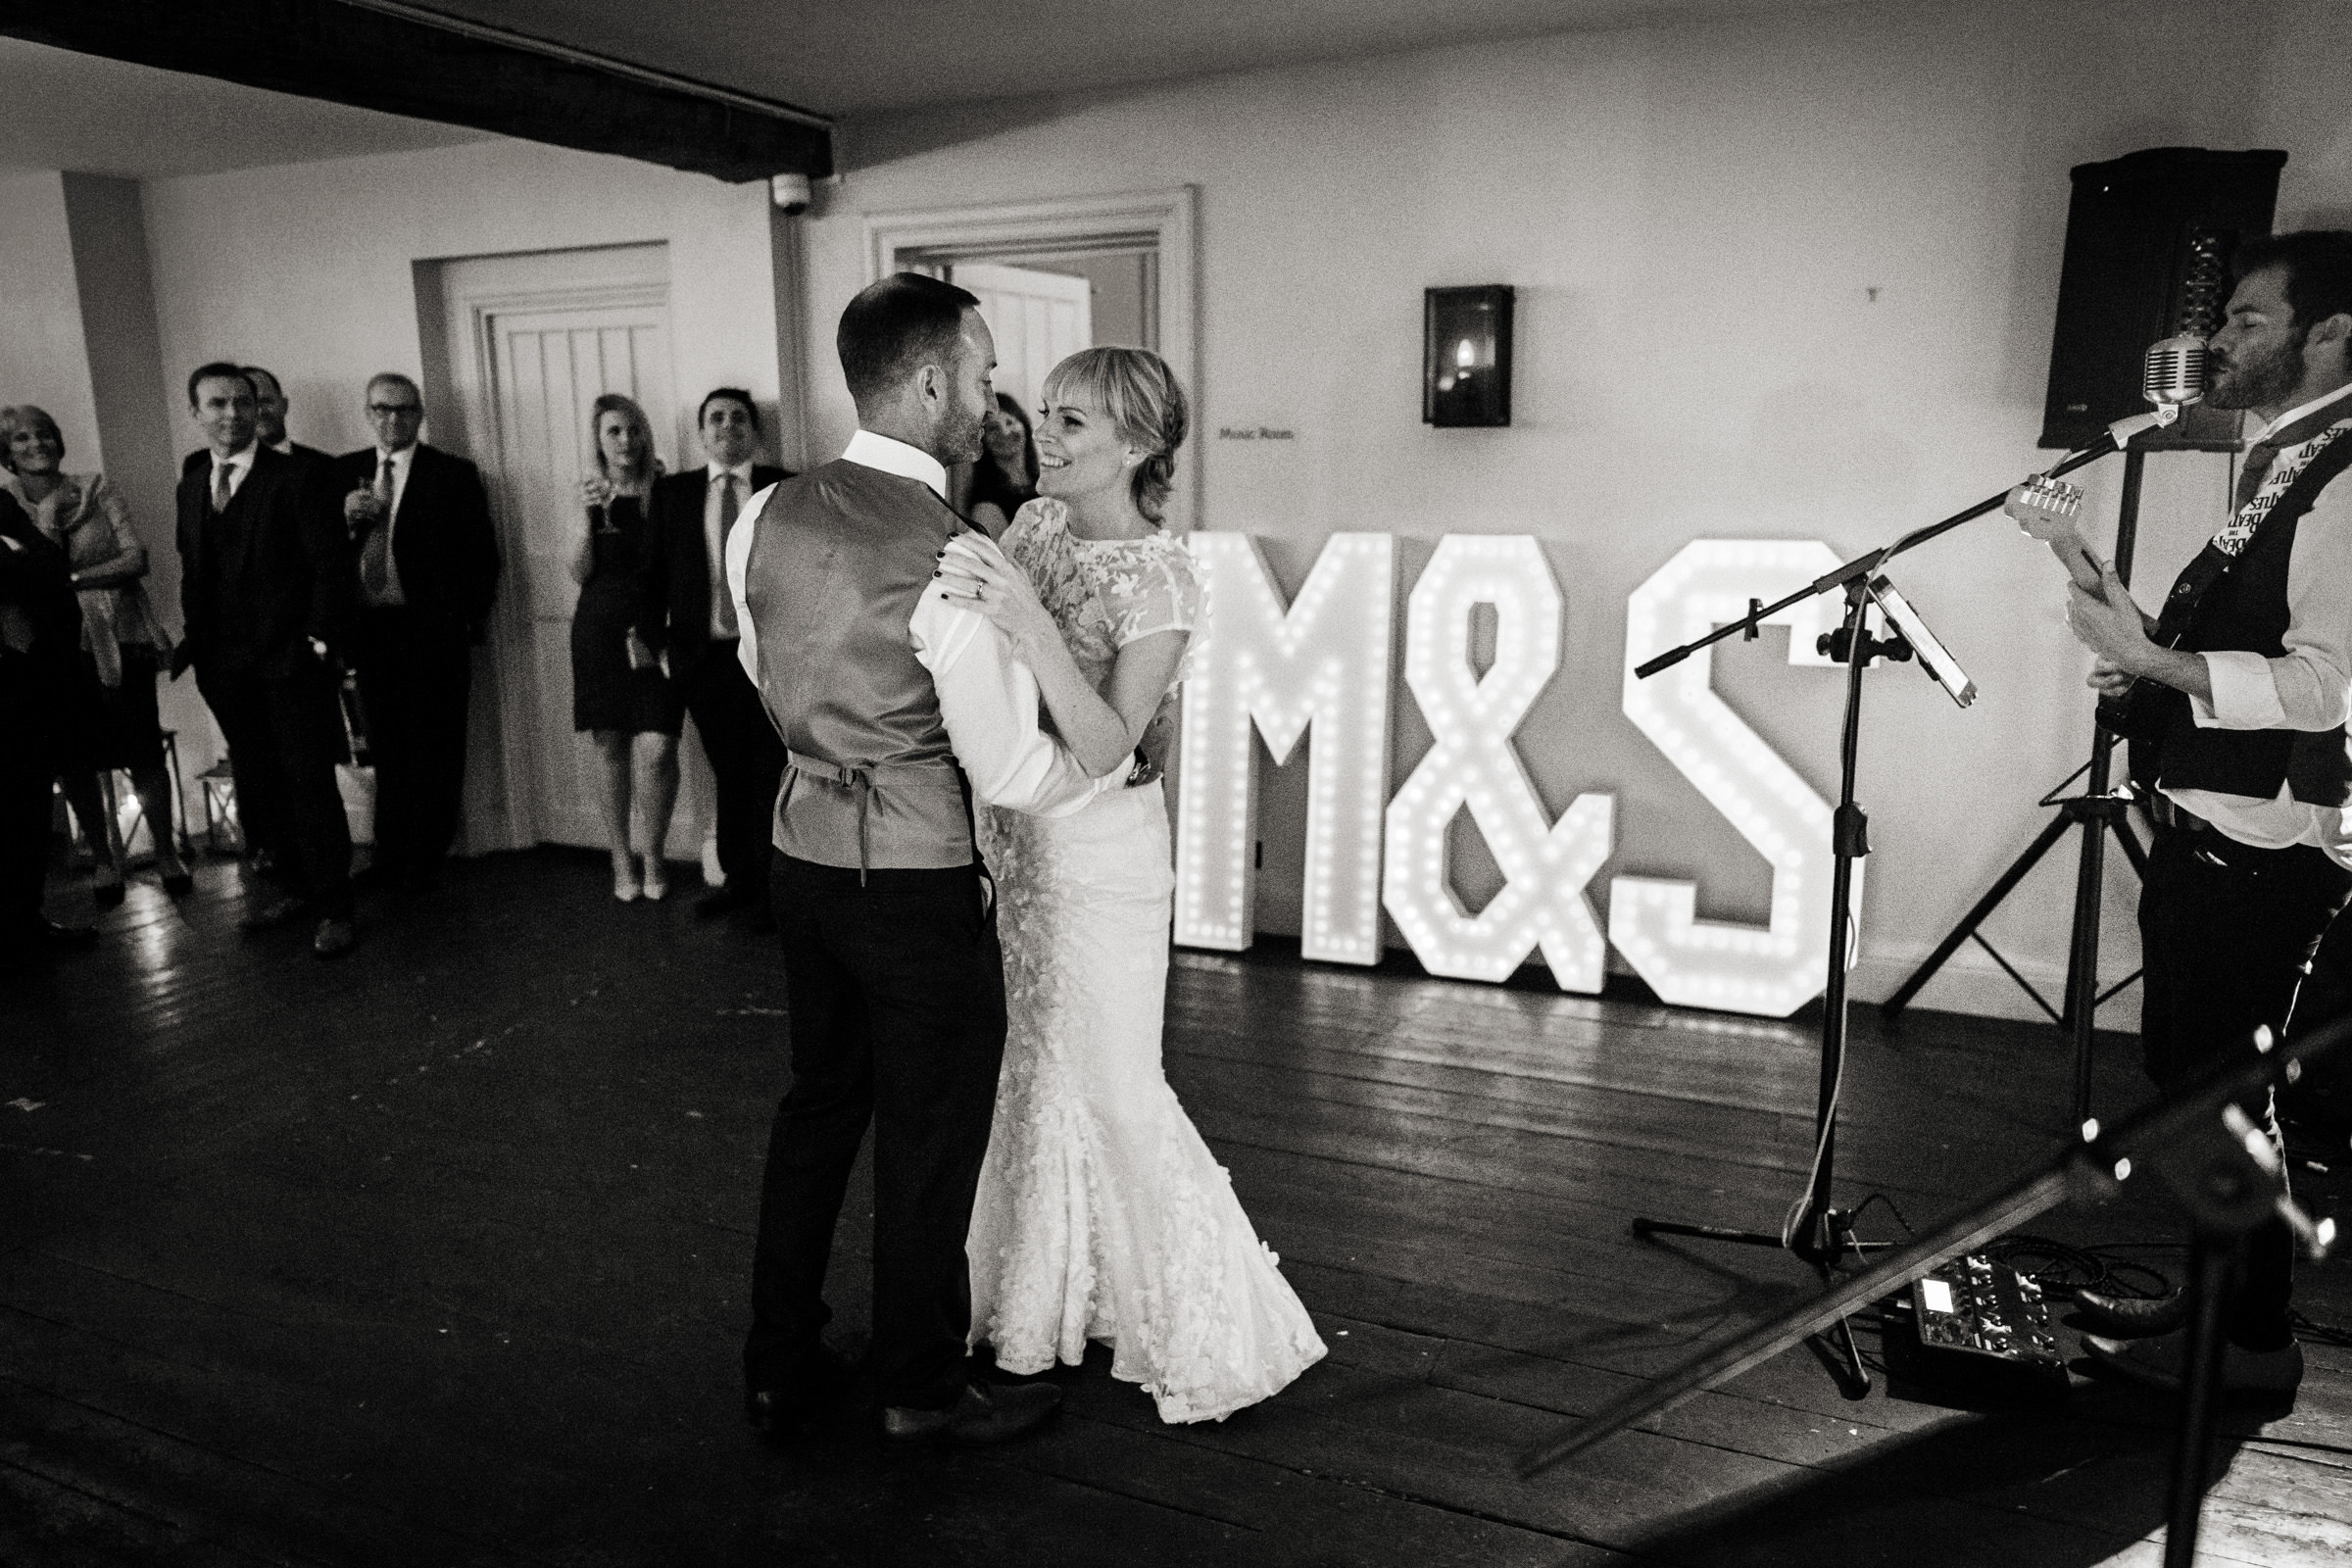 Wedding photos taken at The Olde Bell in Hurley 006.jpg